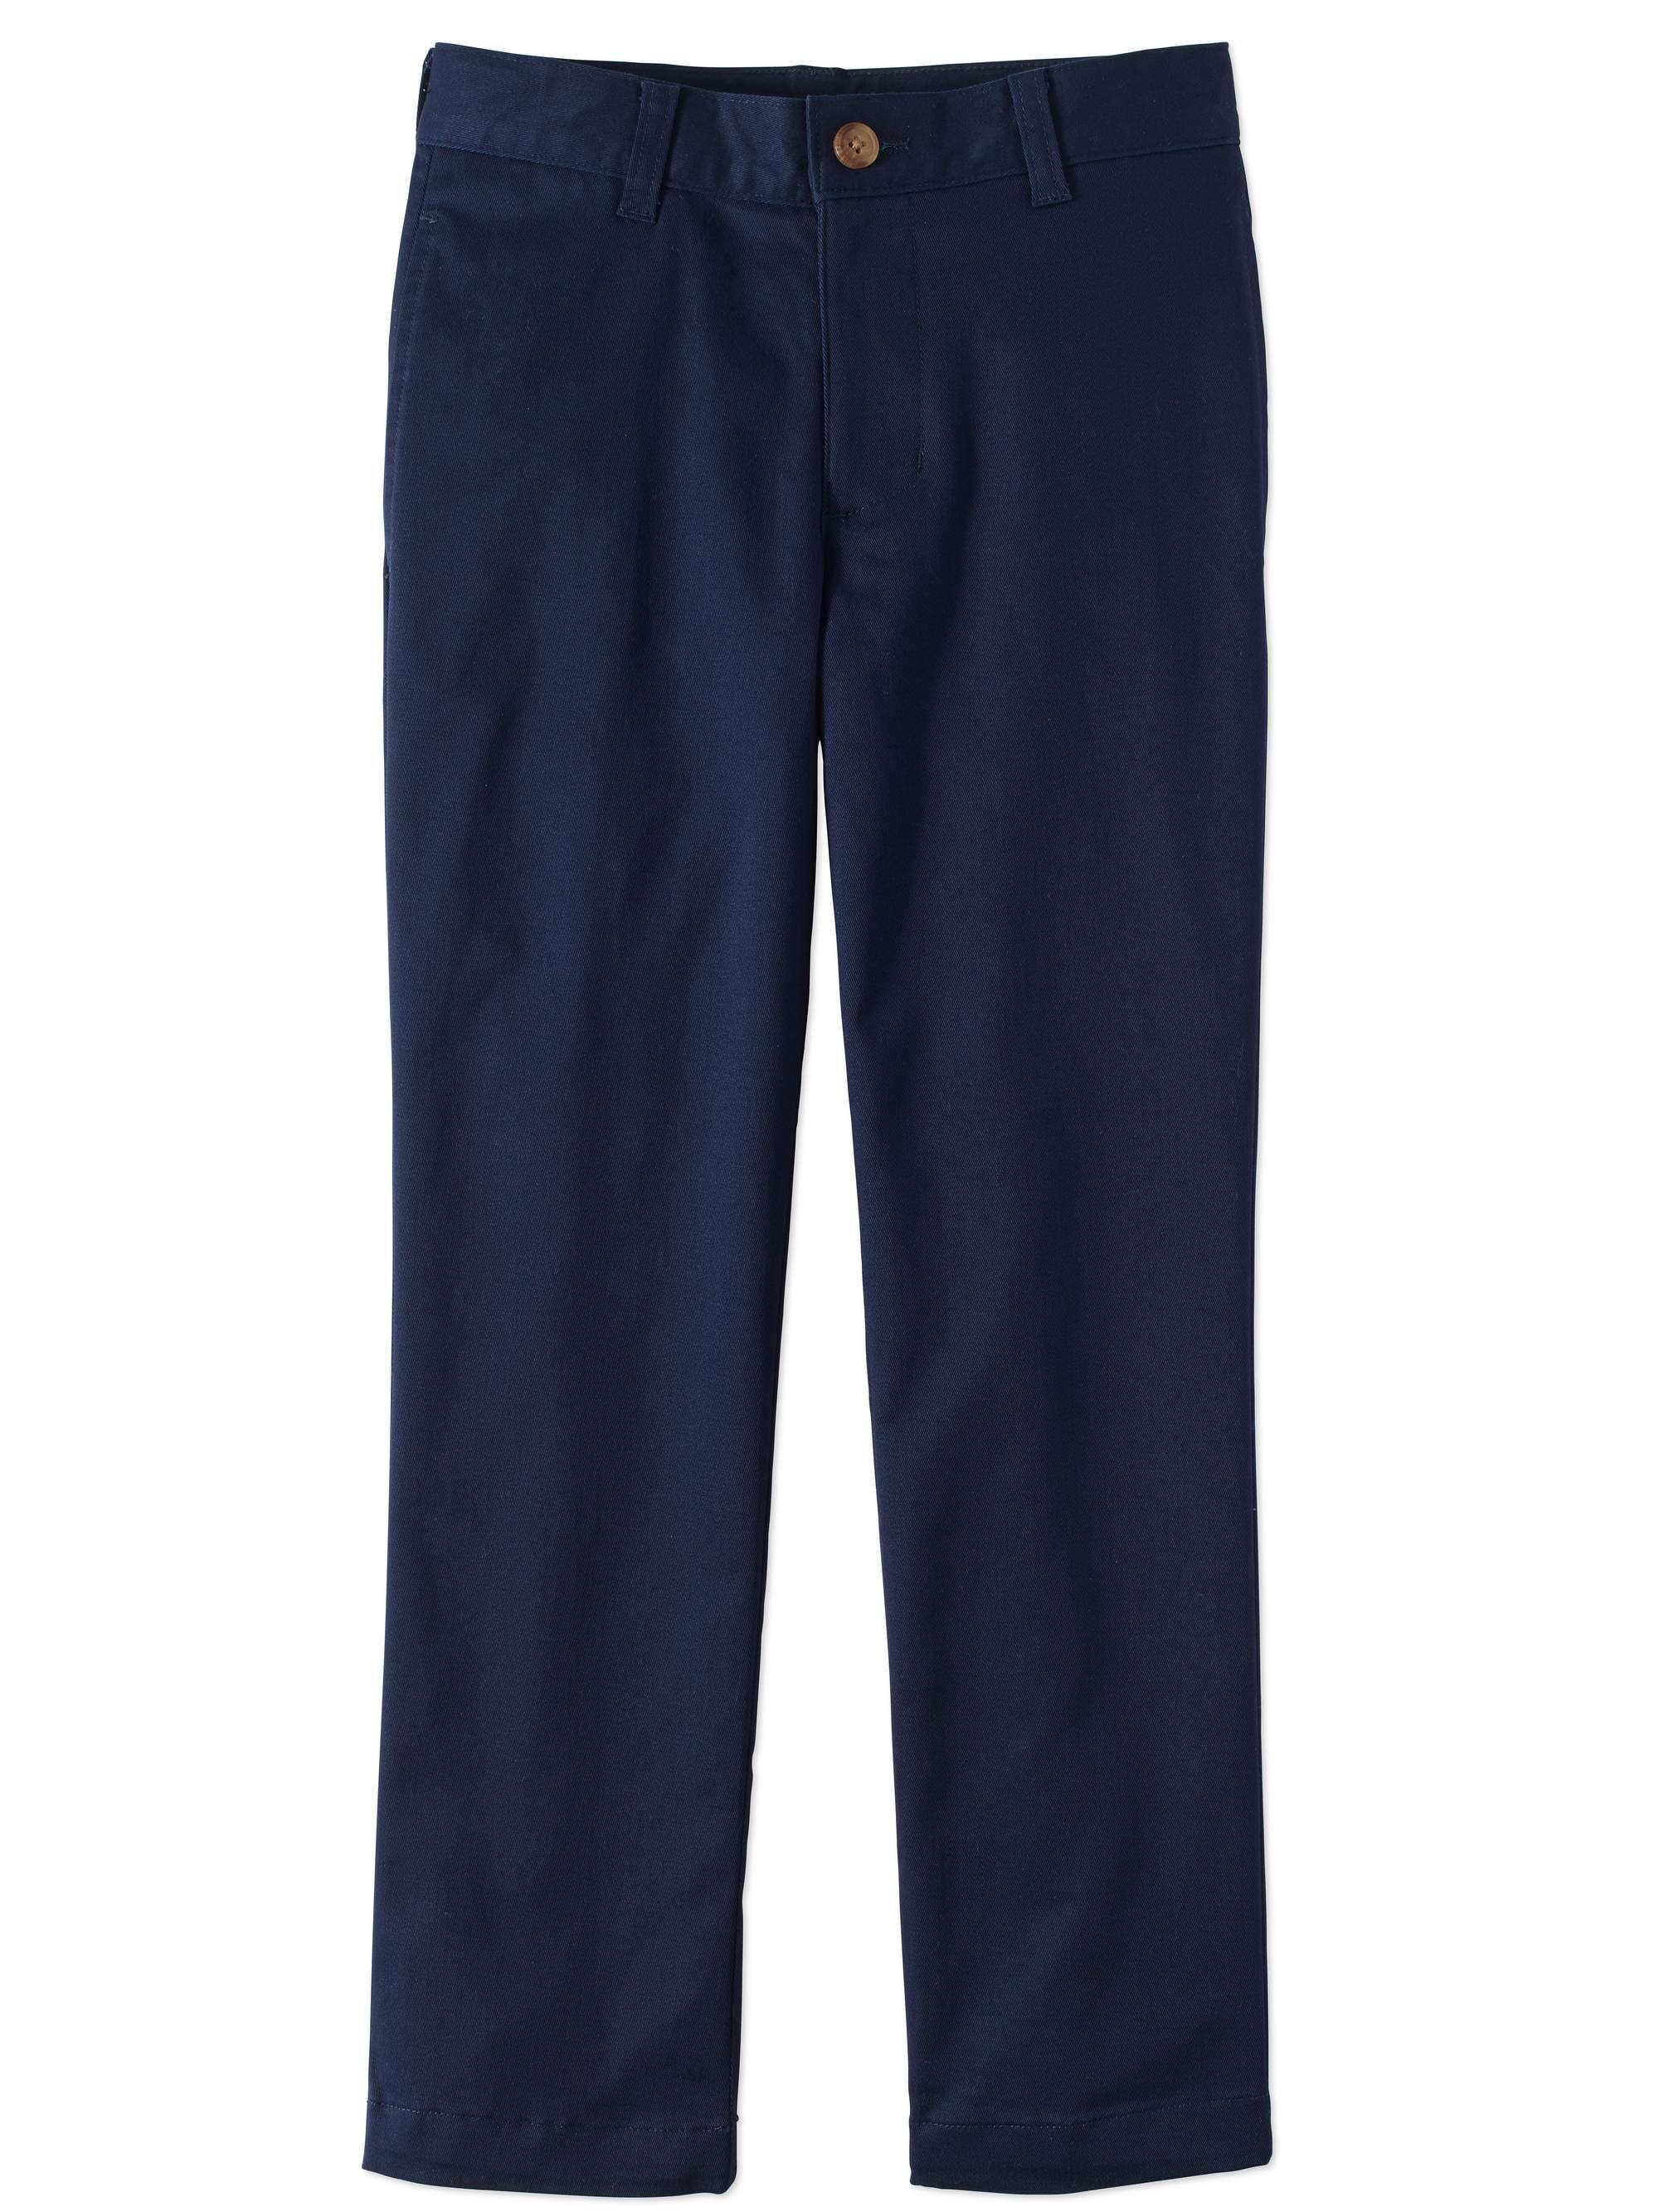 Boys School Uniform Super Stretch Soft Flat Front Pants